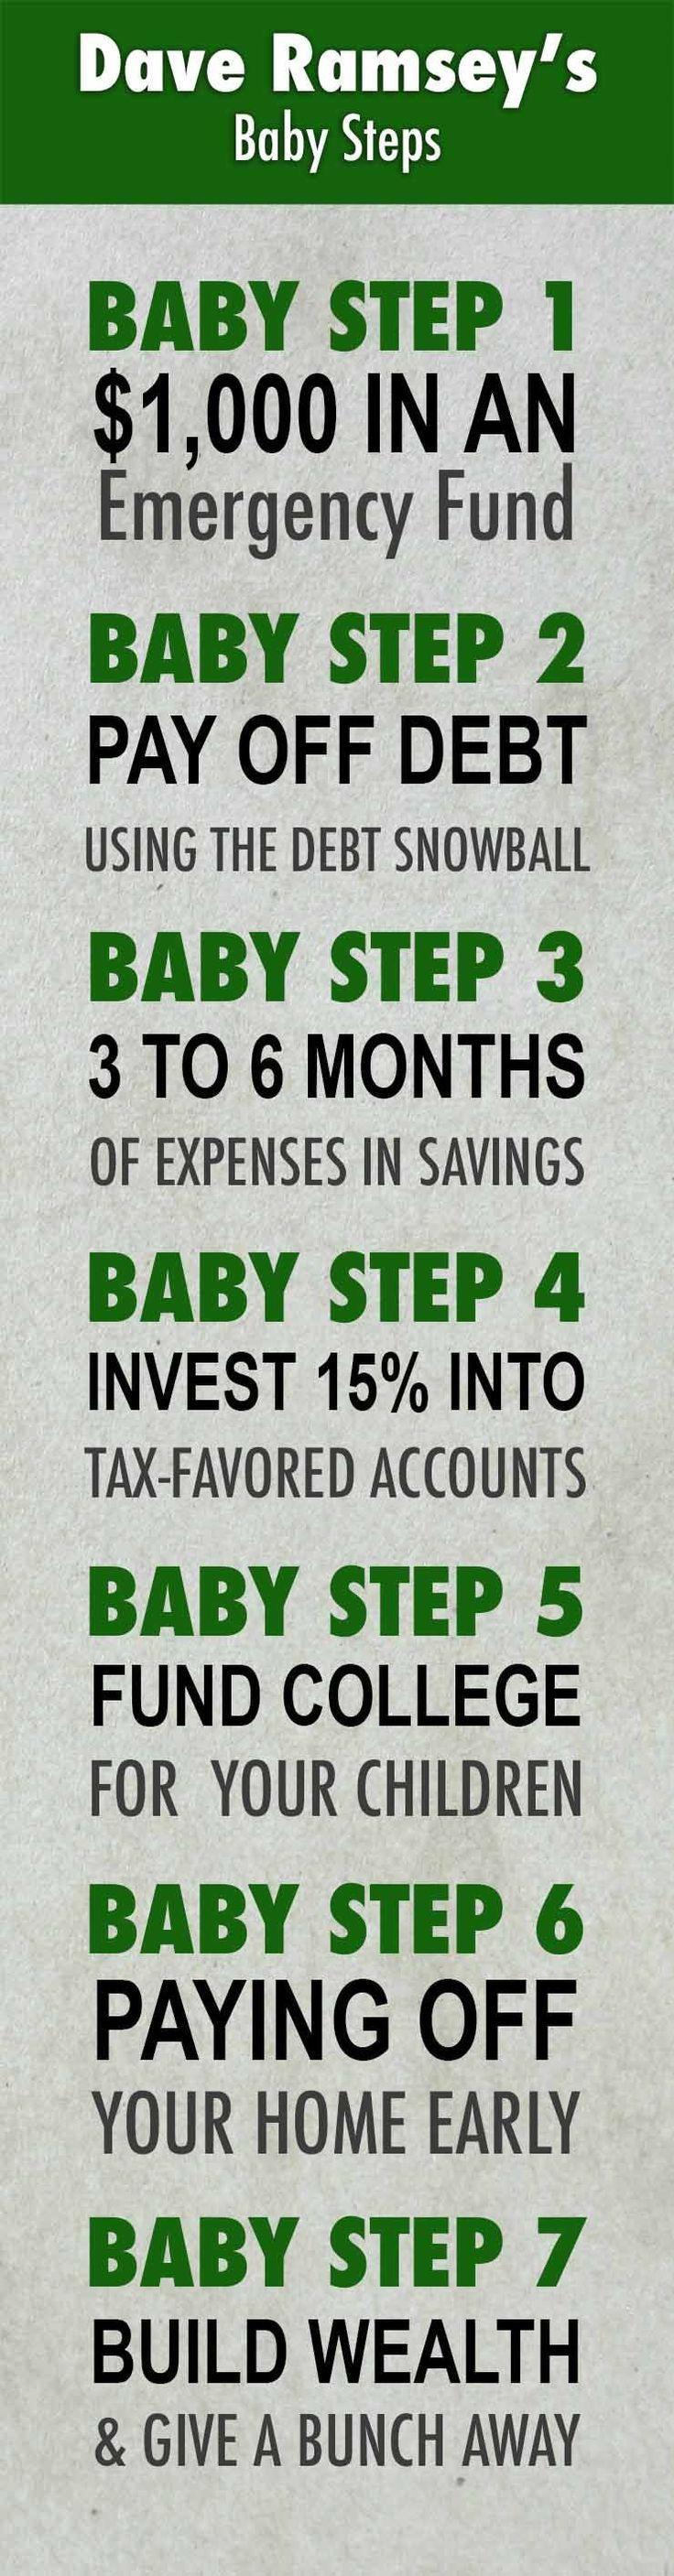 #ramseys #ramseys #steps #steps #what #dave